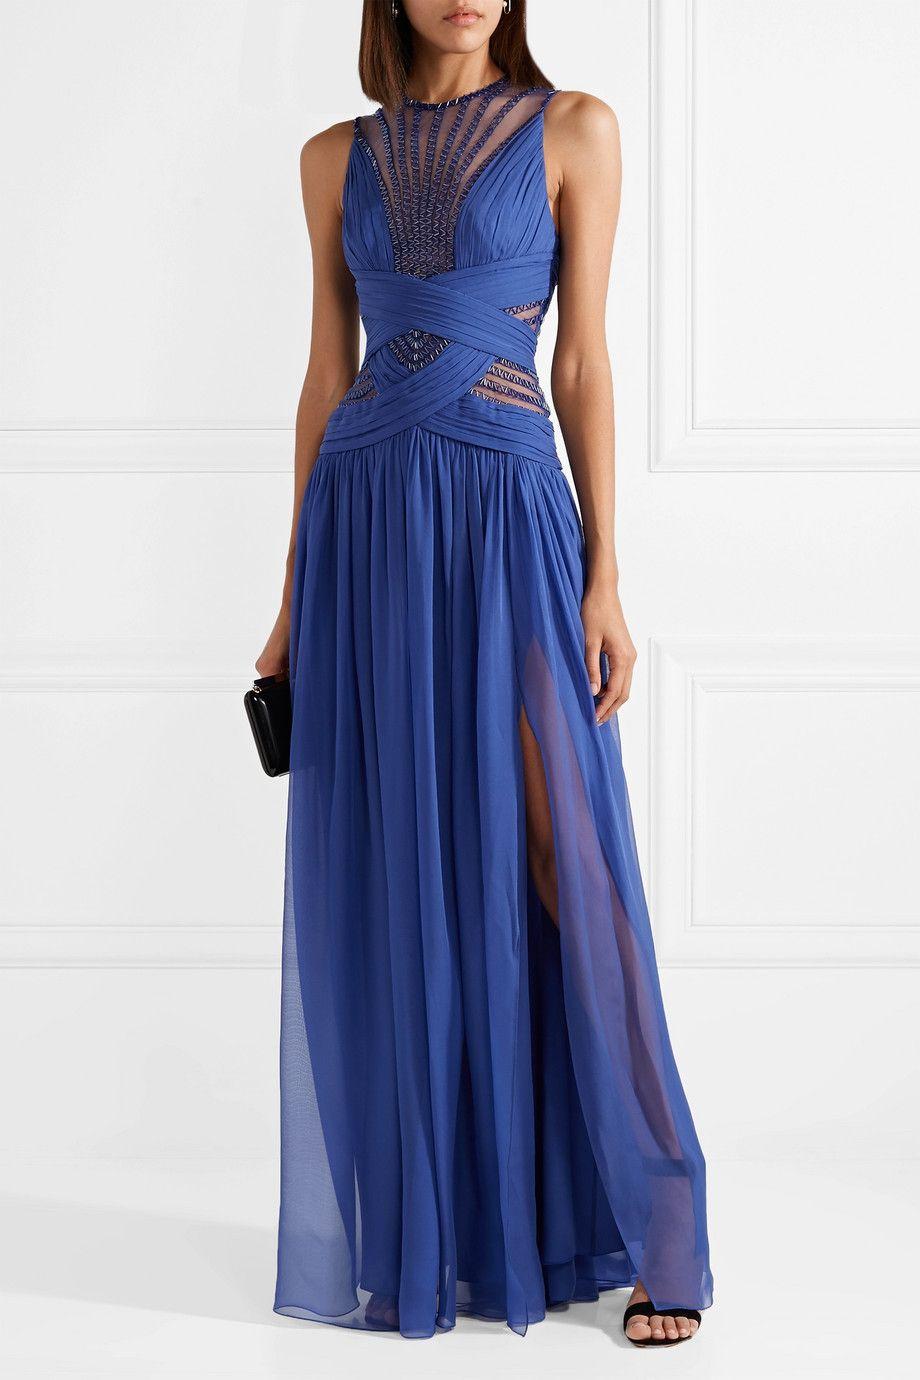 Embellished Organza And Silk-blend Chiffon Gown - Royal blue Zuhair Murad 37lFp